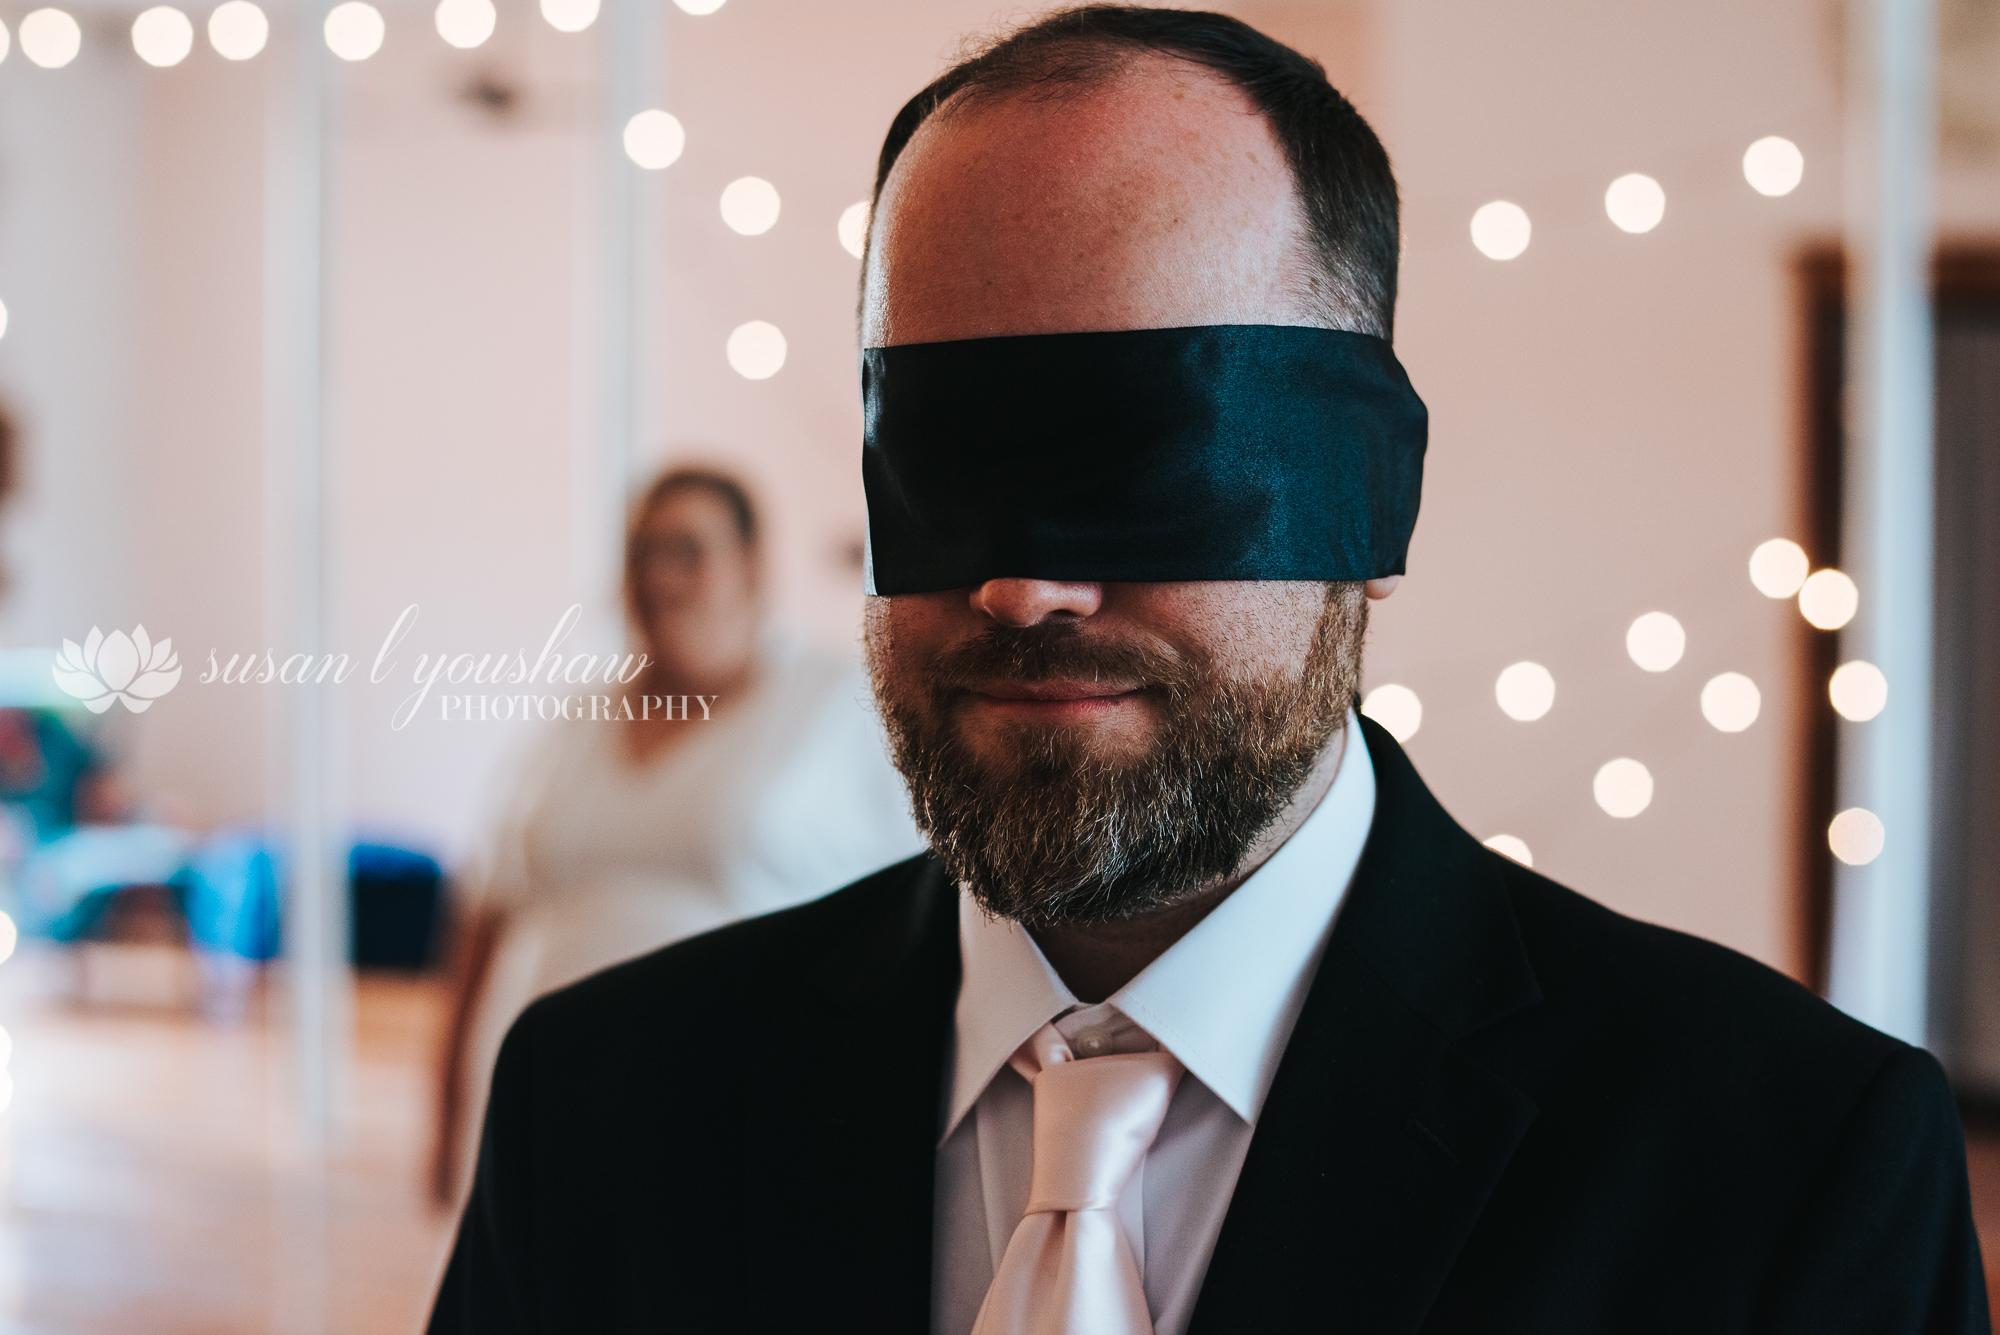 Bill and Sarah Wedding Photos 06-08-2019 SLY Photography -3.jpg